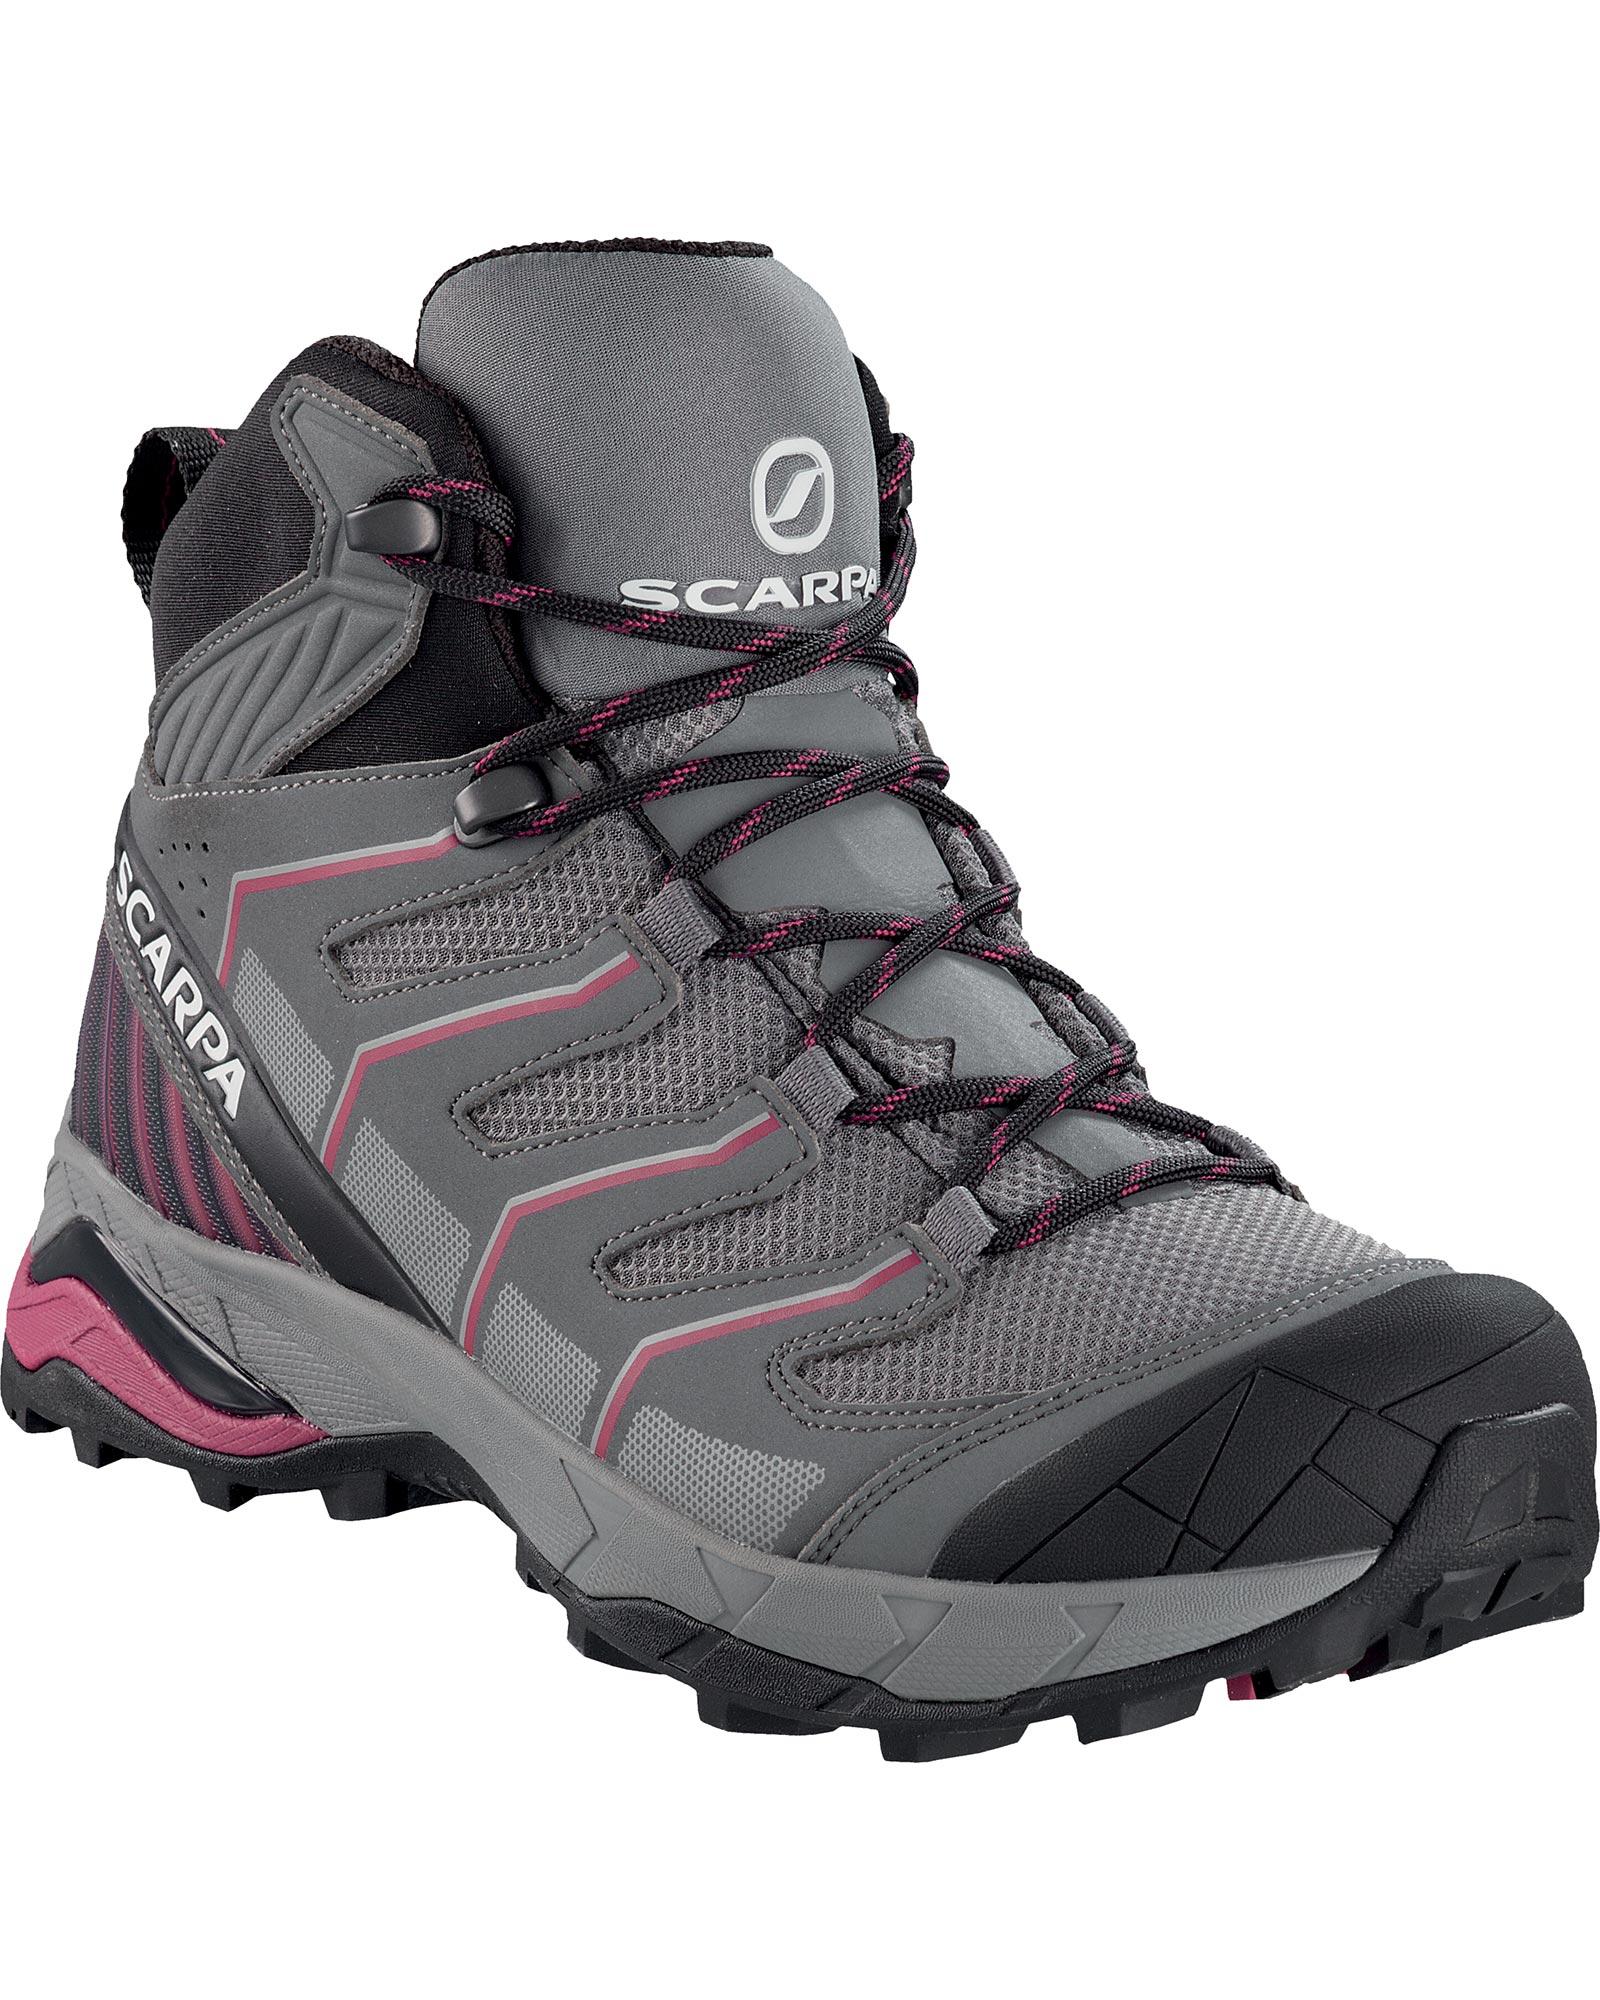 Scarpa Women's Maverick GORE-TEX Walking Boots 0